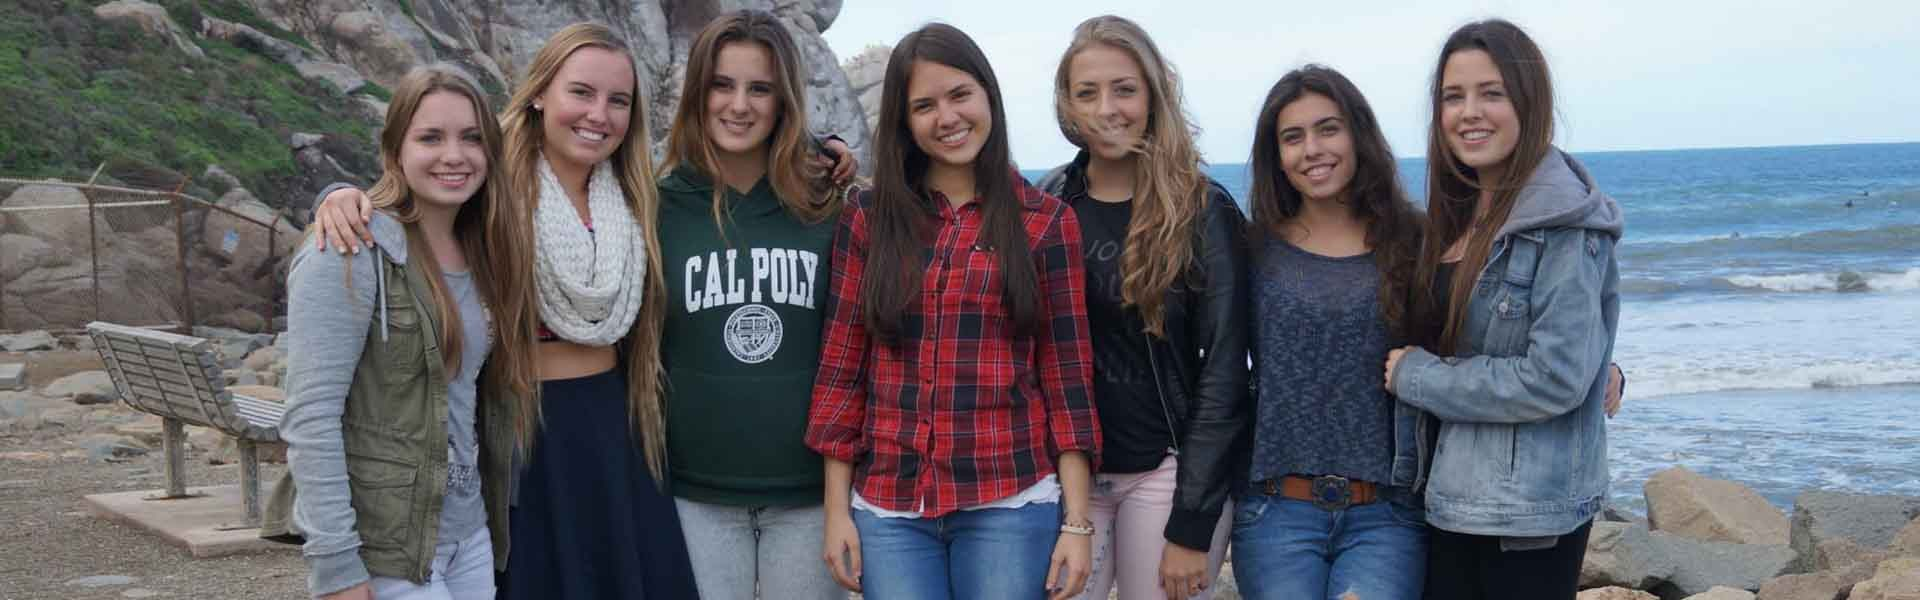 SanLuisCostal-Highschool-CA-Coast-Main-Banner-US-2019